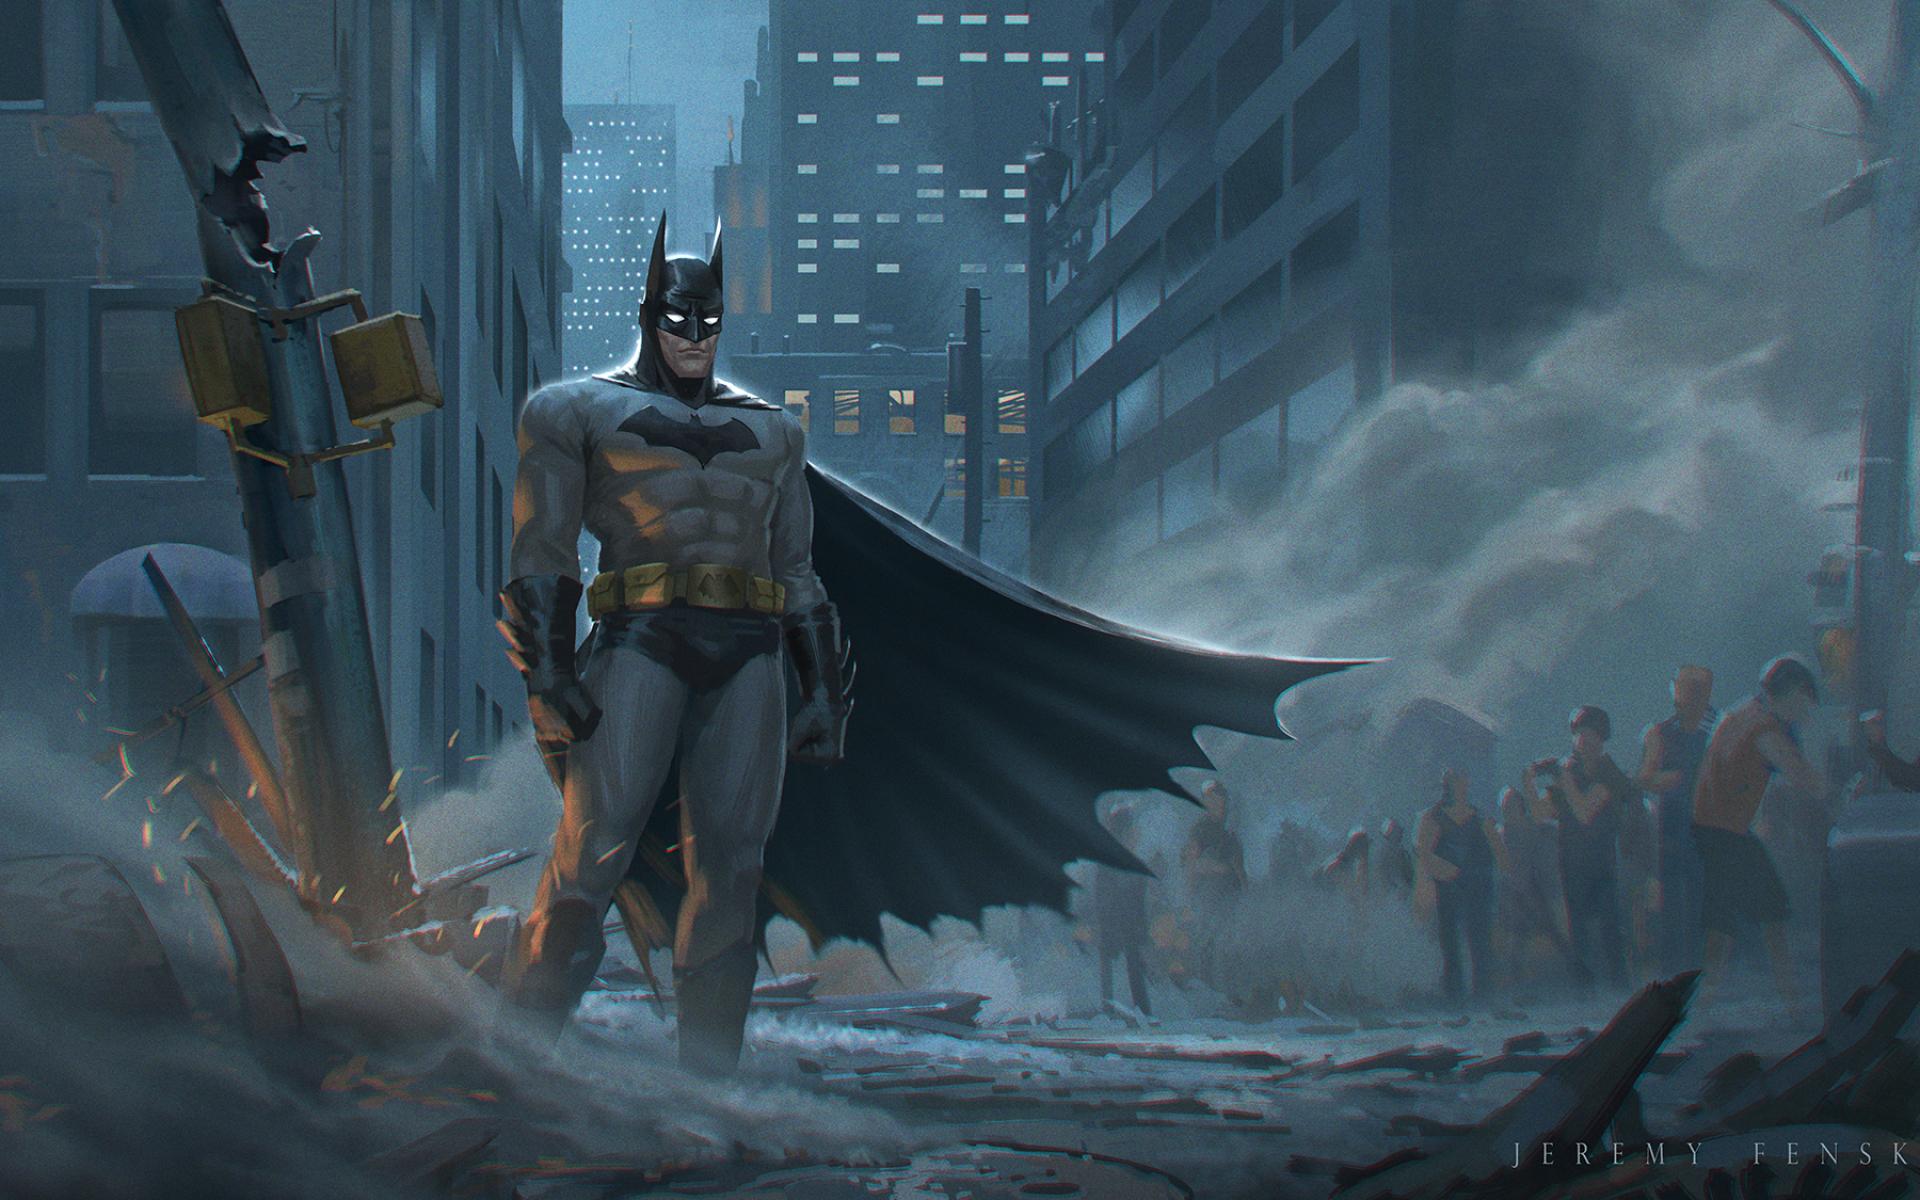 Batman The Animated Series Fanart 2281668 Hd Wallpaper